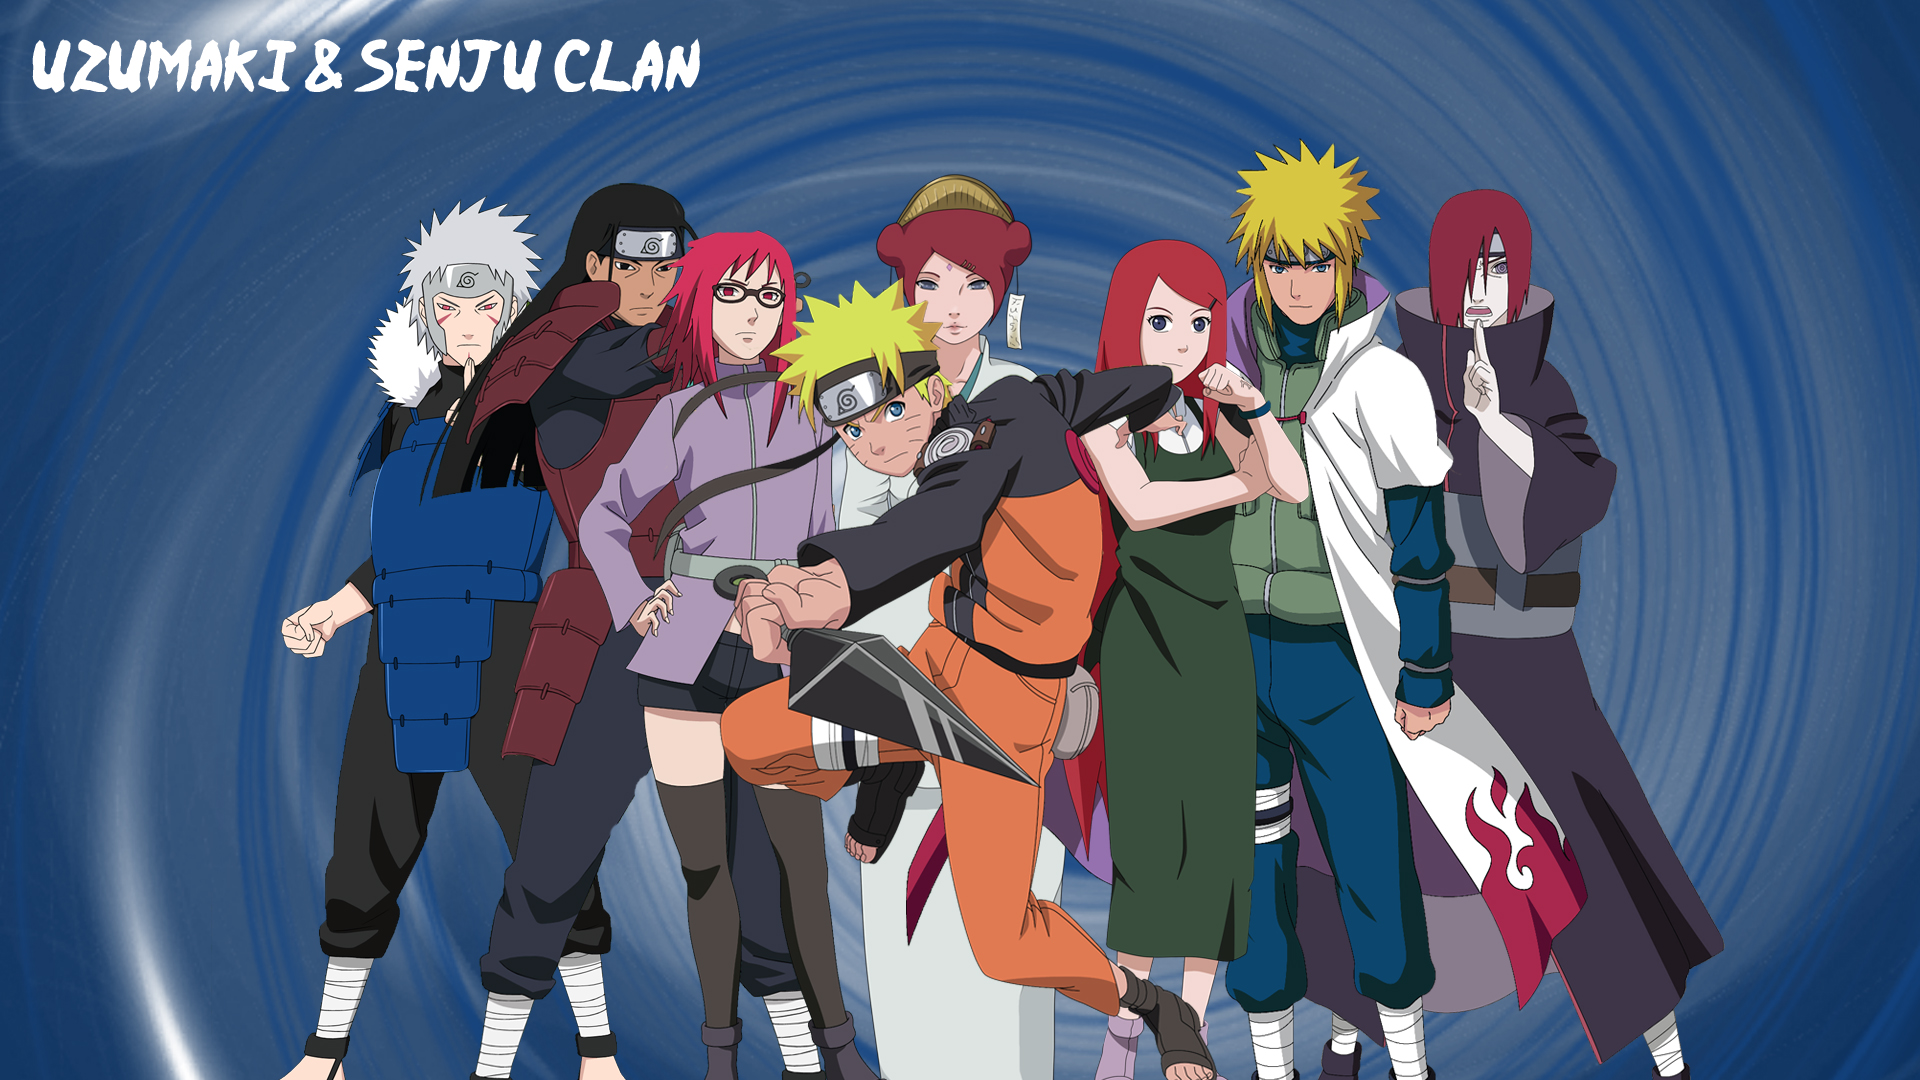 Uzumaki and Senju Clan by Ishiku5238 on DeviantArt